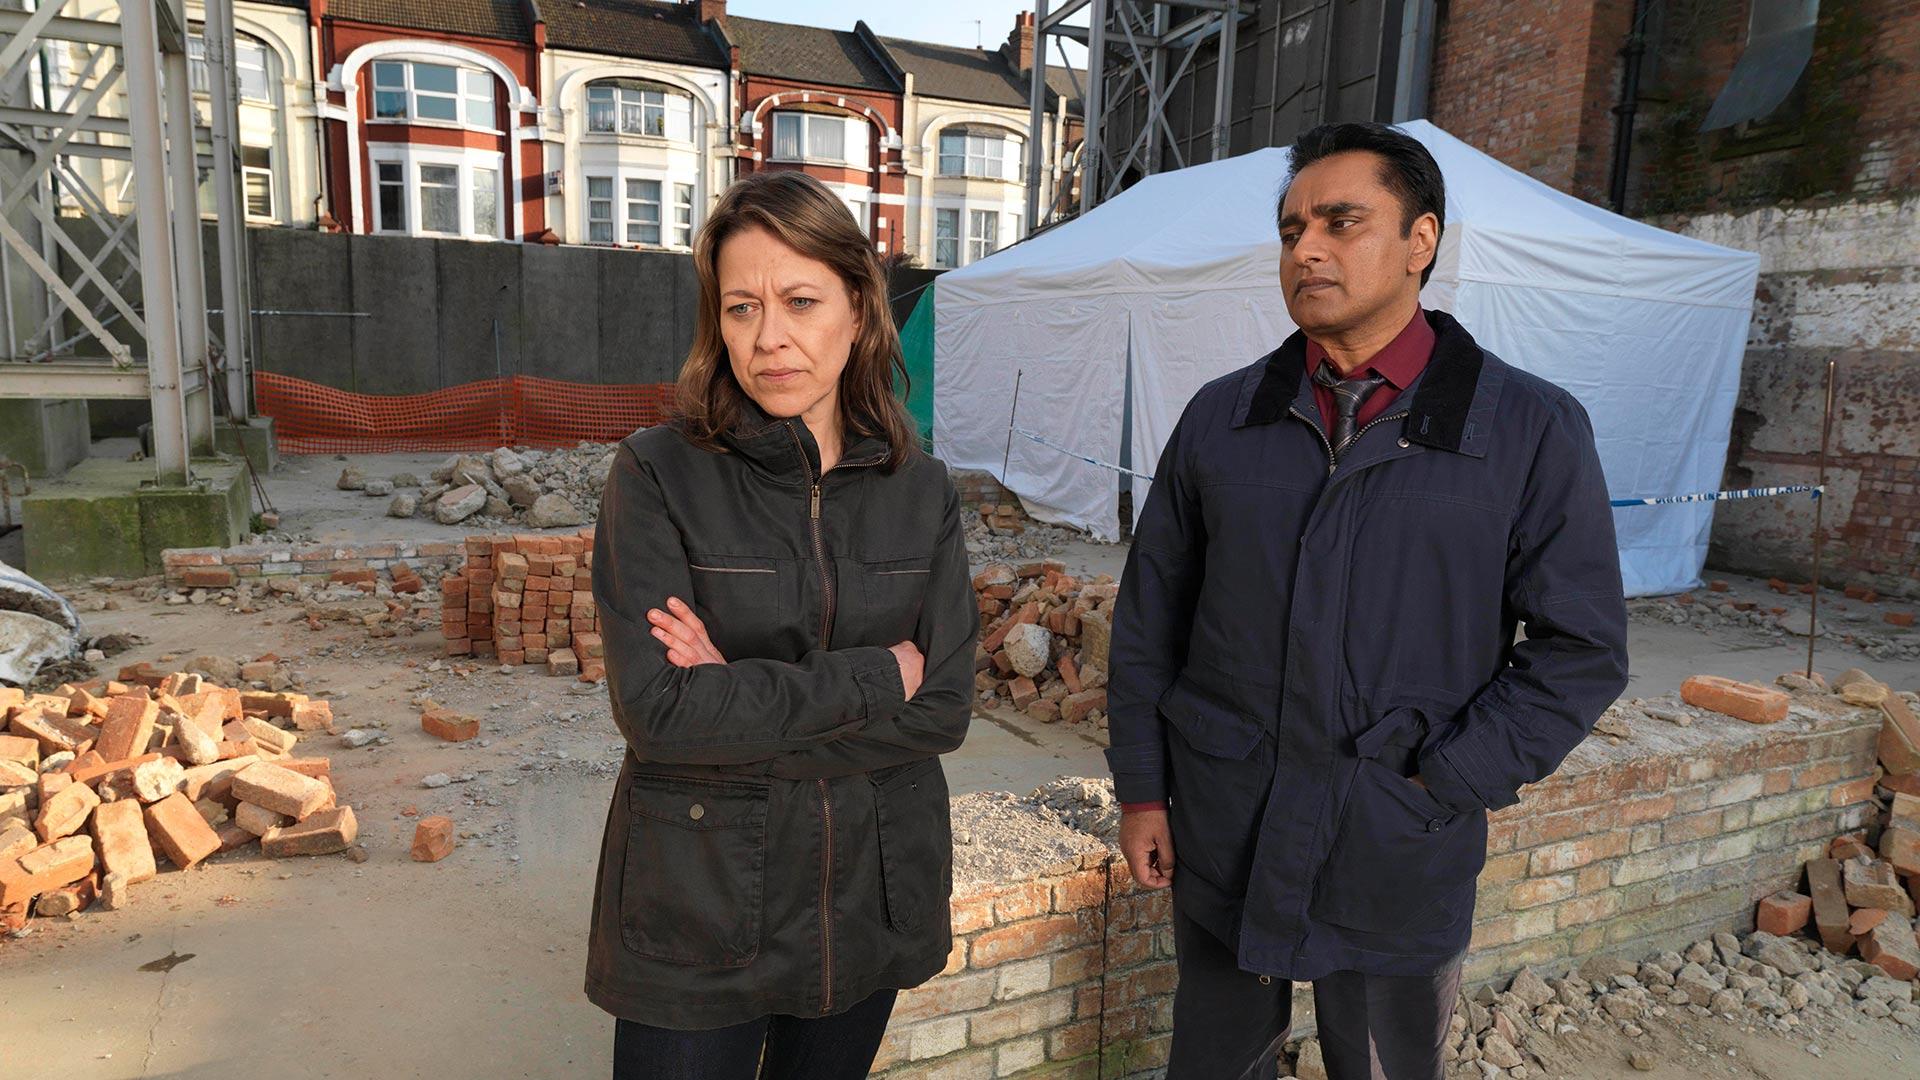 Nicola Walker as DCI Cassie Stuart and Sanjeev Bhaskar as DS Sunny Khan.